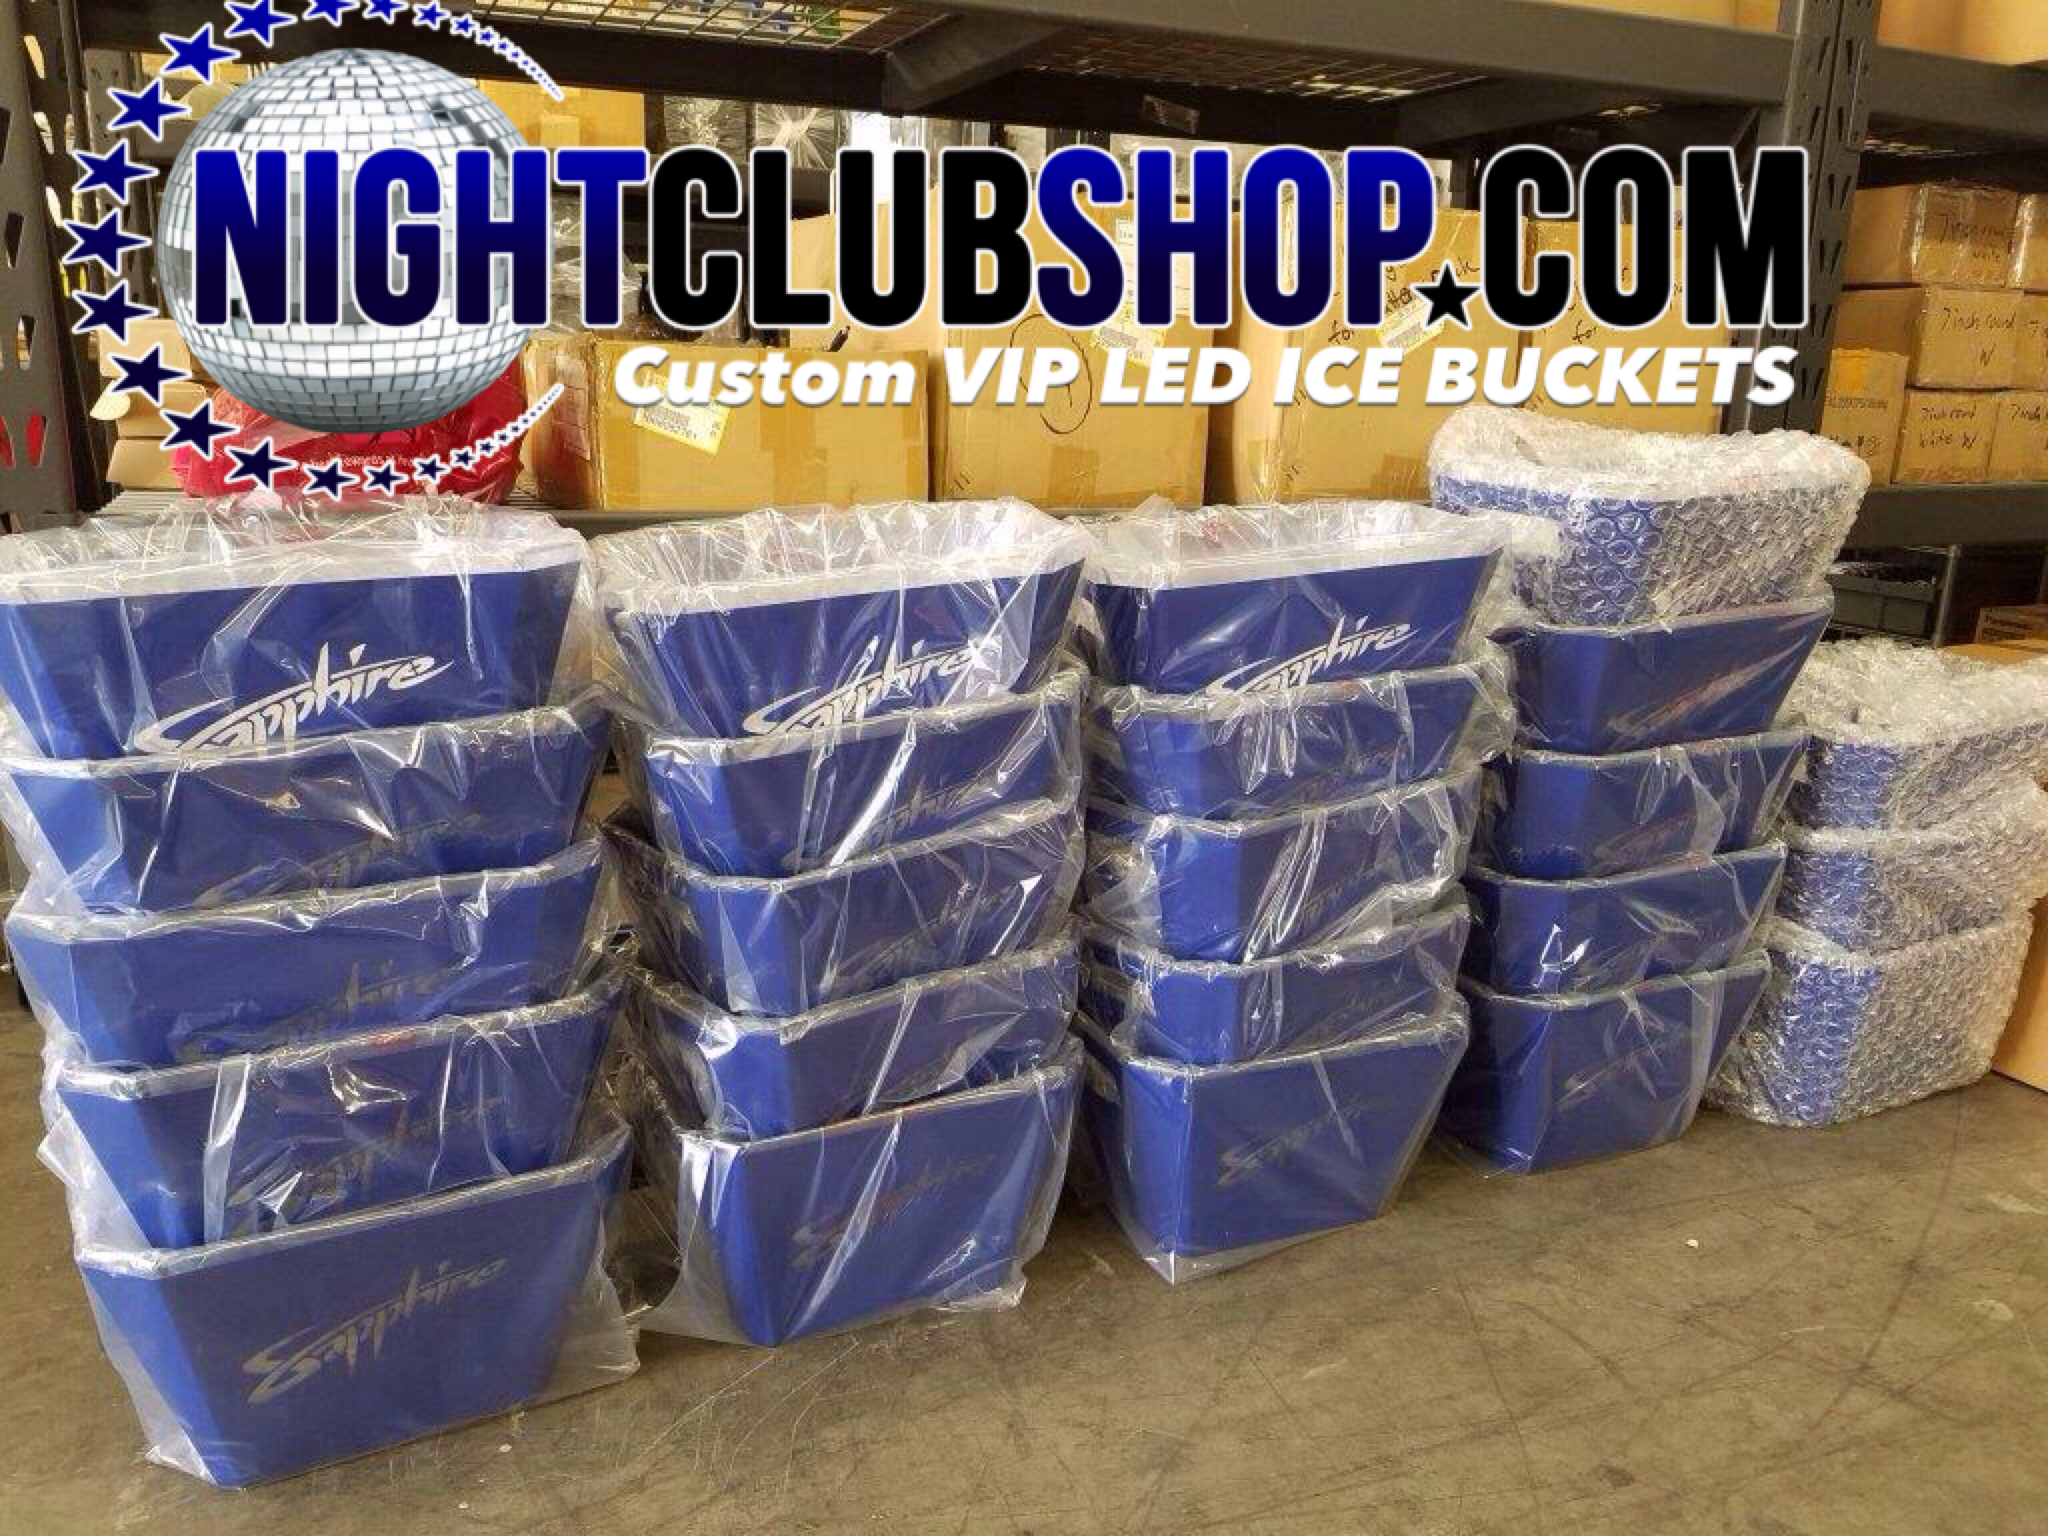 led-ice-bucket-bottle-present-tub-custom-brand-bulk-nightclubshop.png